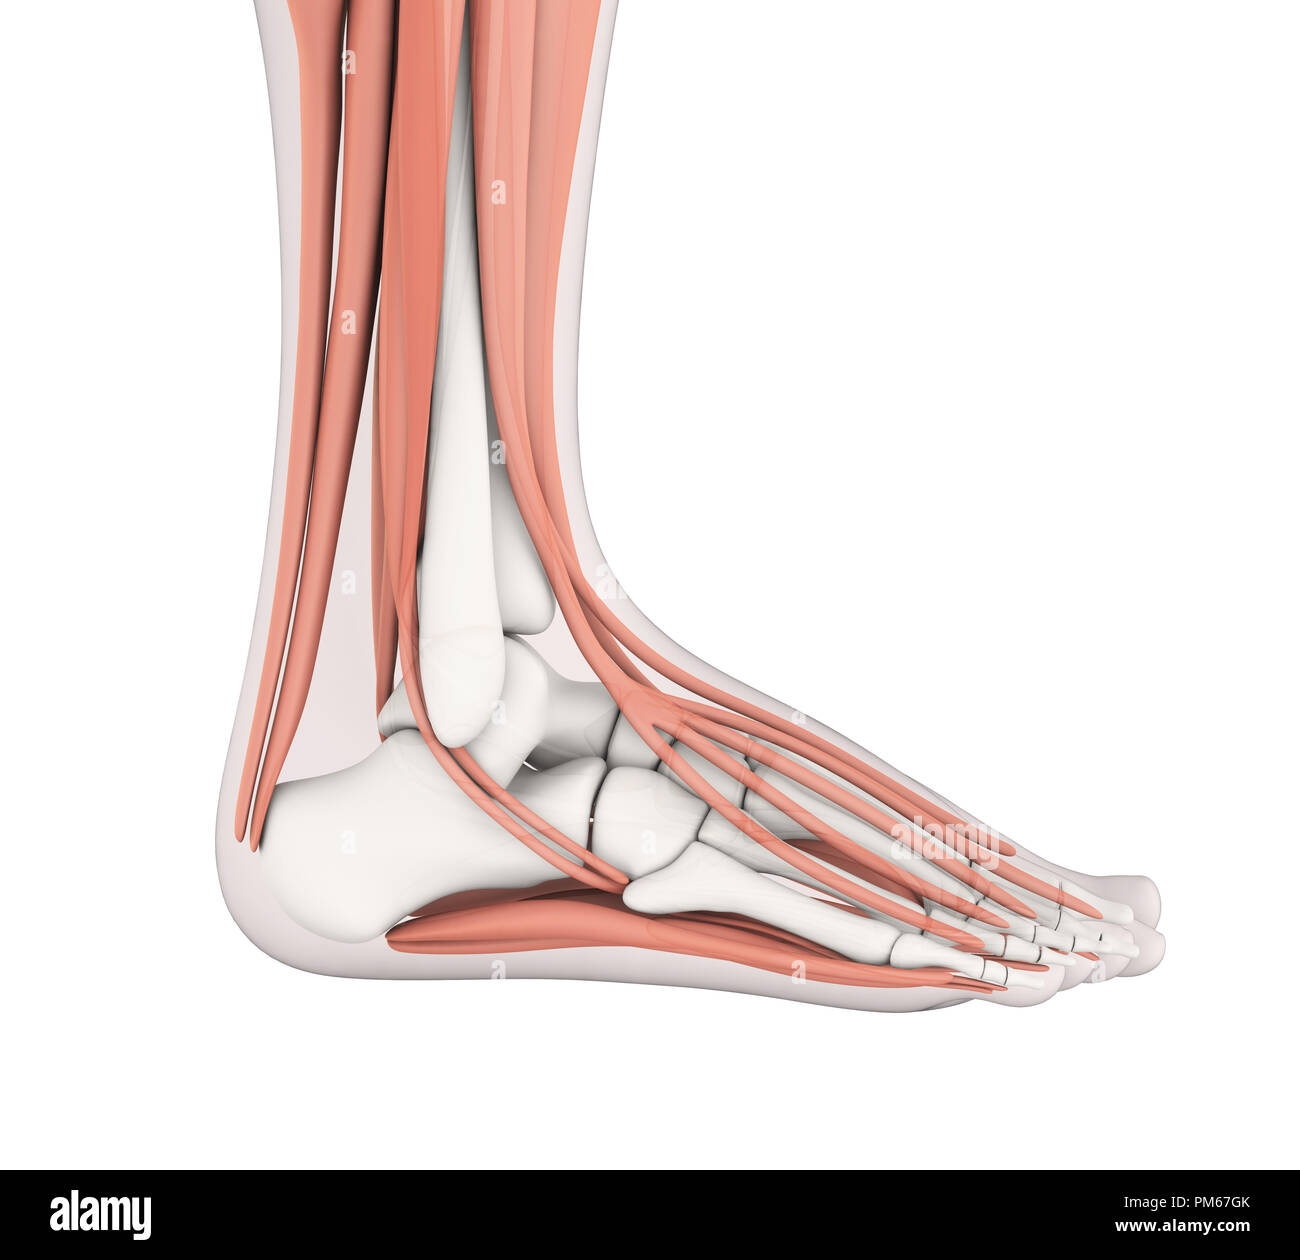 Anatomie des muscles du pied humain Photo Stock